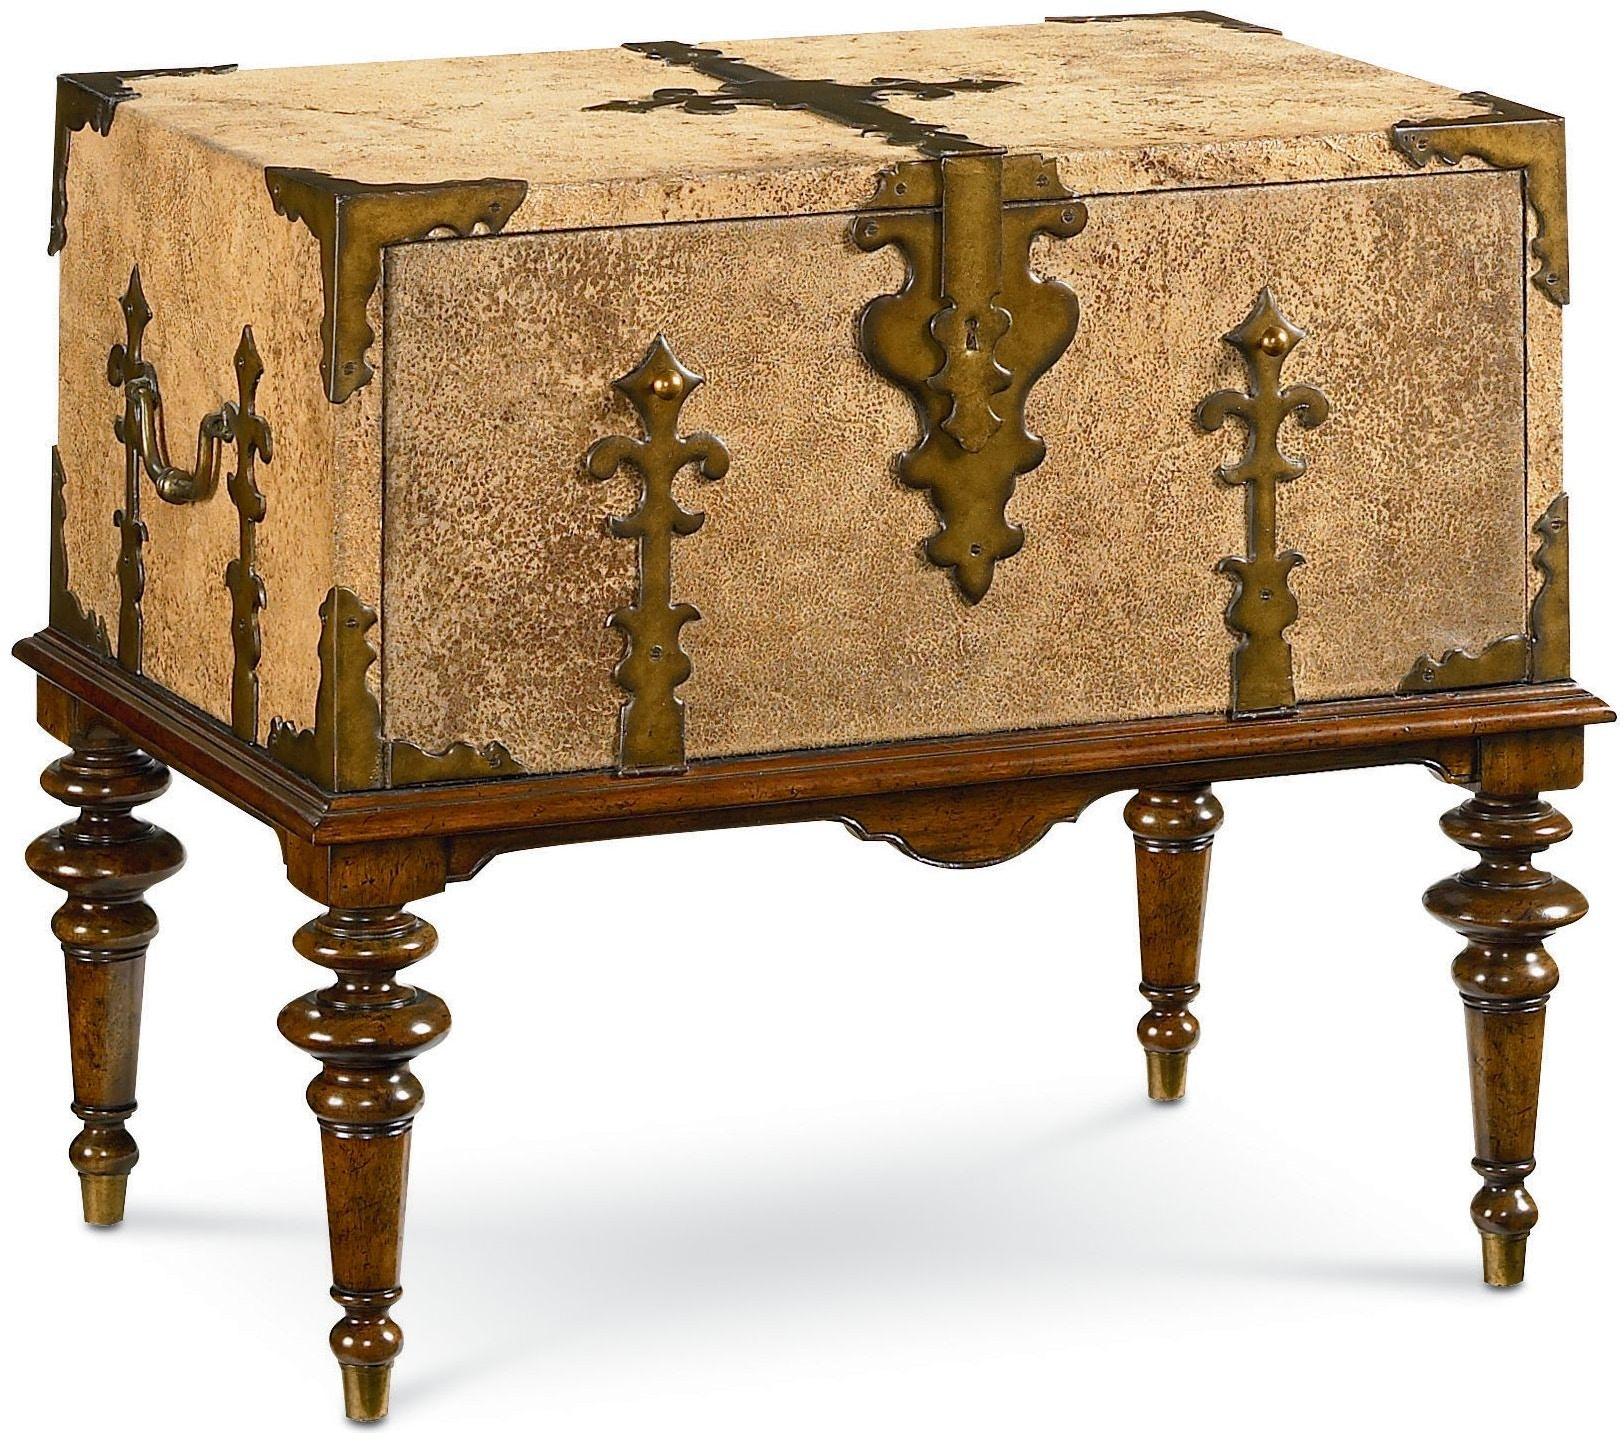 Thomasville Accessories Traveler S Box On Stand 46291 215